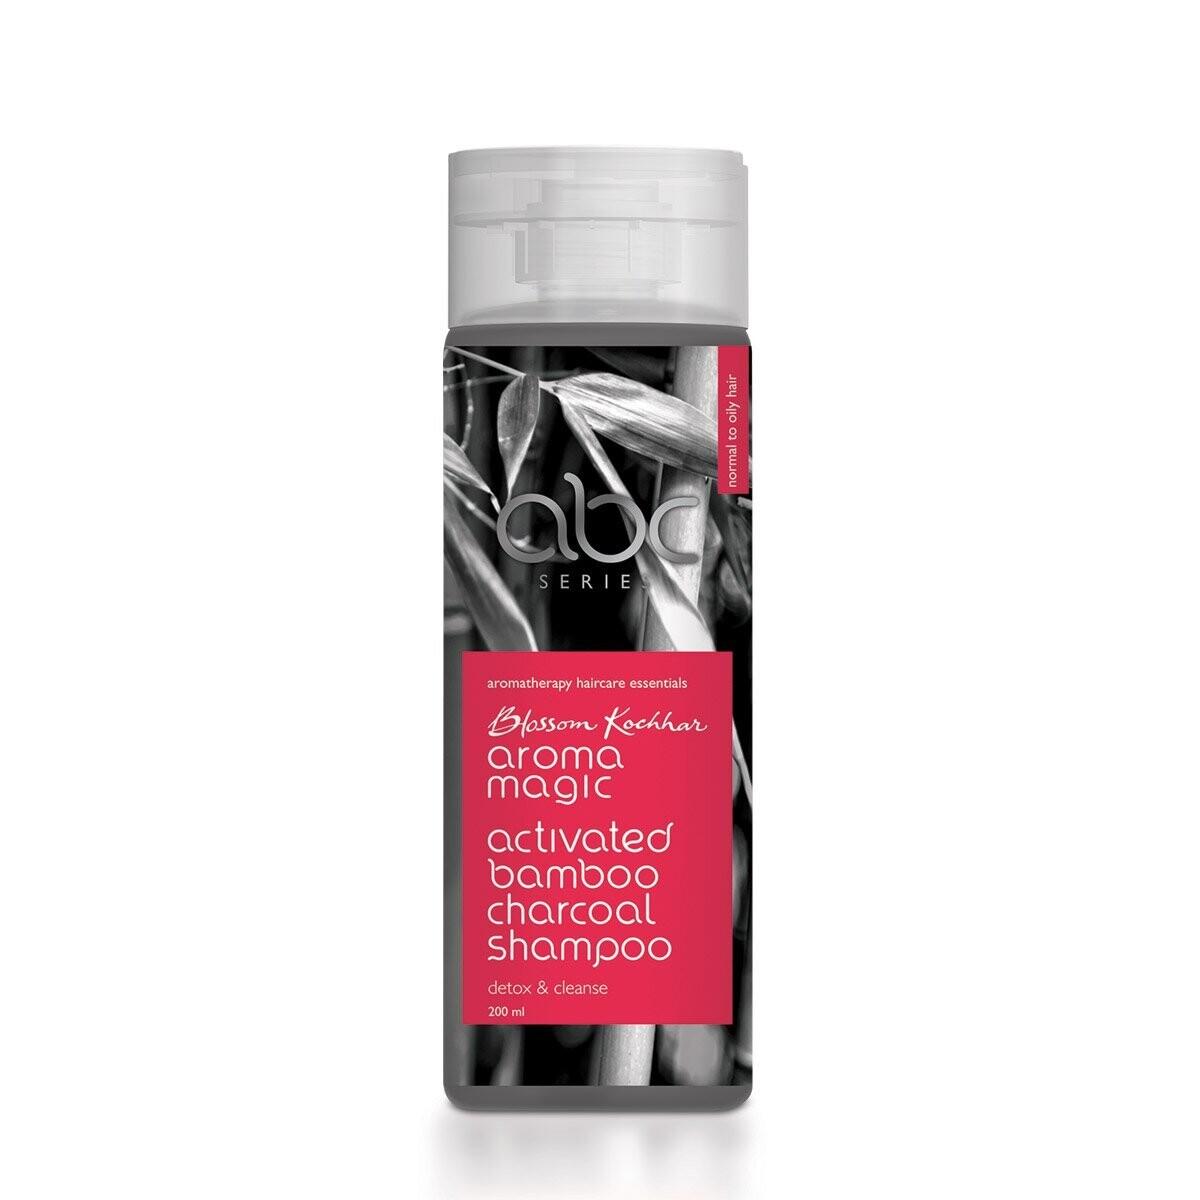 Aroma Magic Activated Bamboo Charcoal Shampoo 200 G